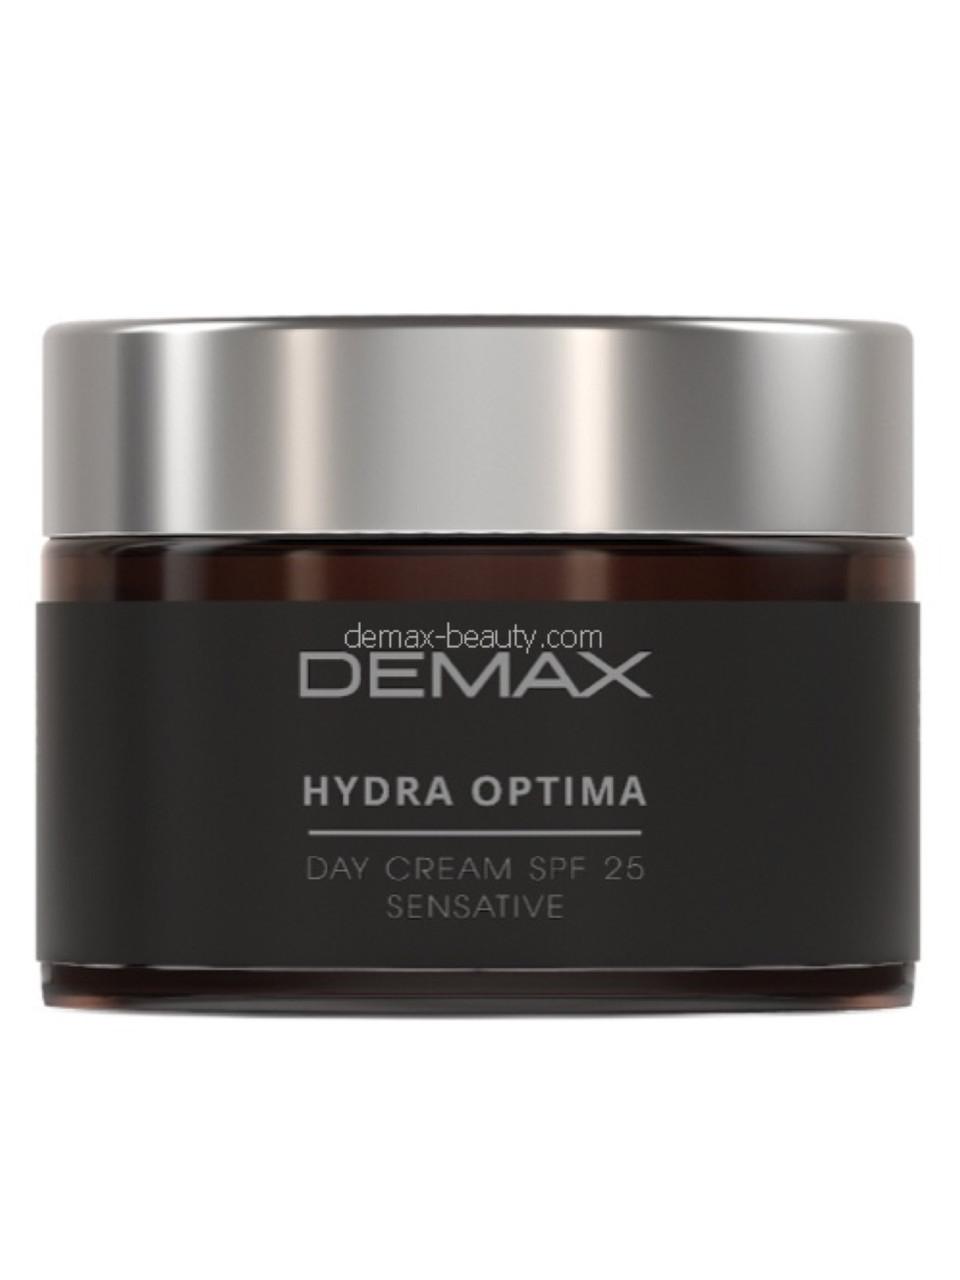 Крем для лица увлажняющий Demax spf 25 Нydra optima day cream spf 25 sensitive 50ml арт.224